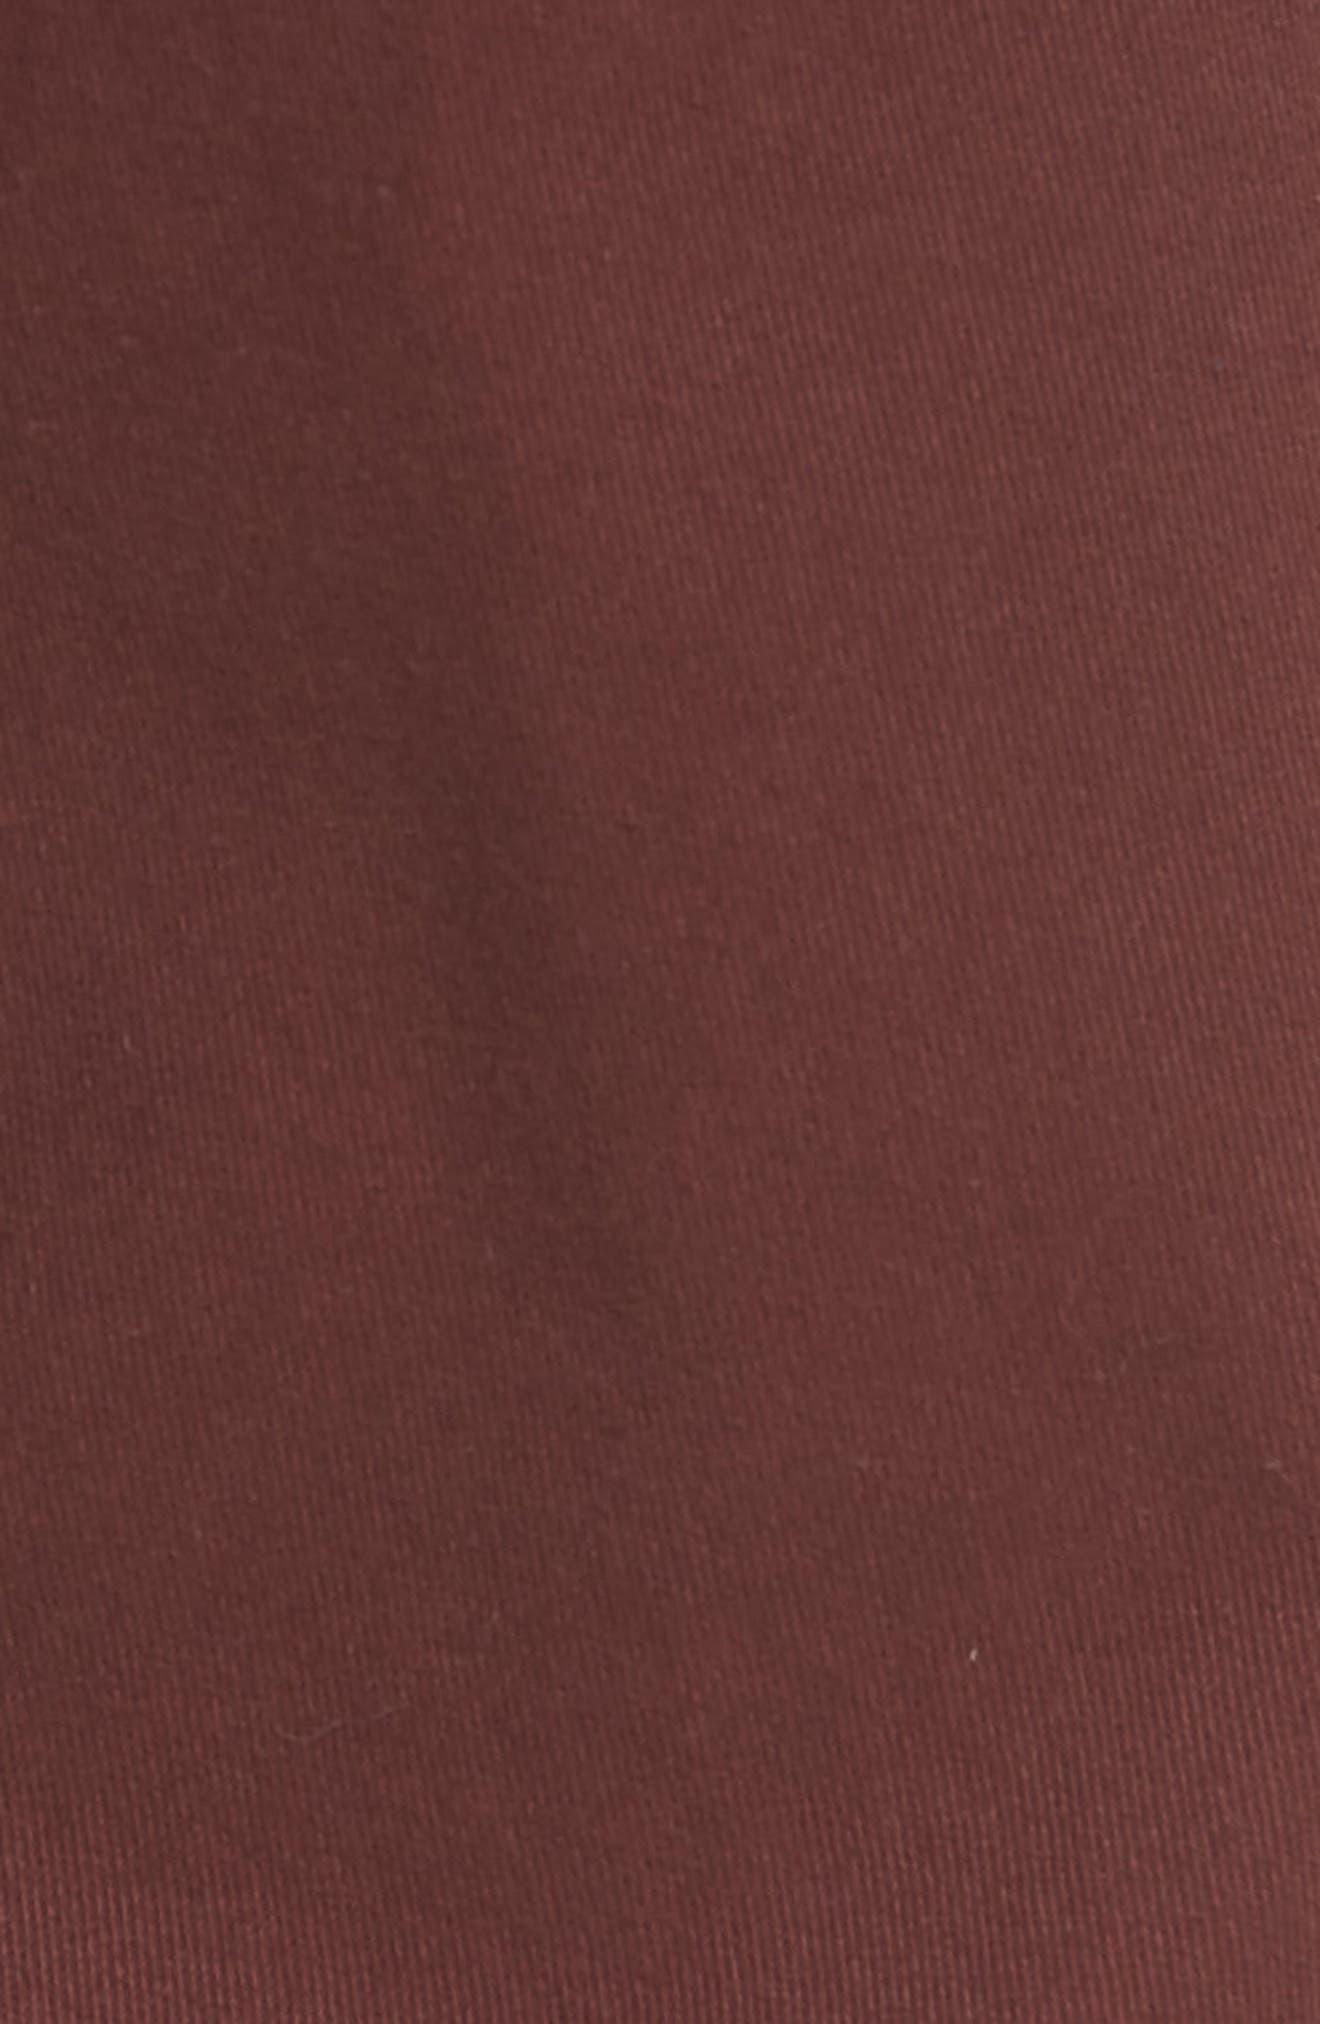 Regular Fit Five-Pocket Pants,                             Alternate thumbnail 10, color,